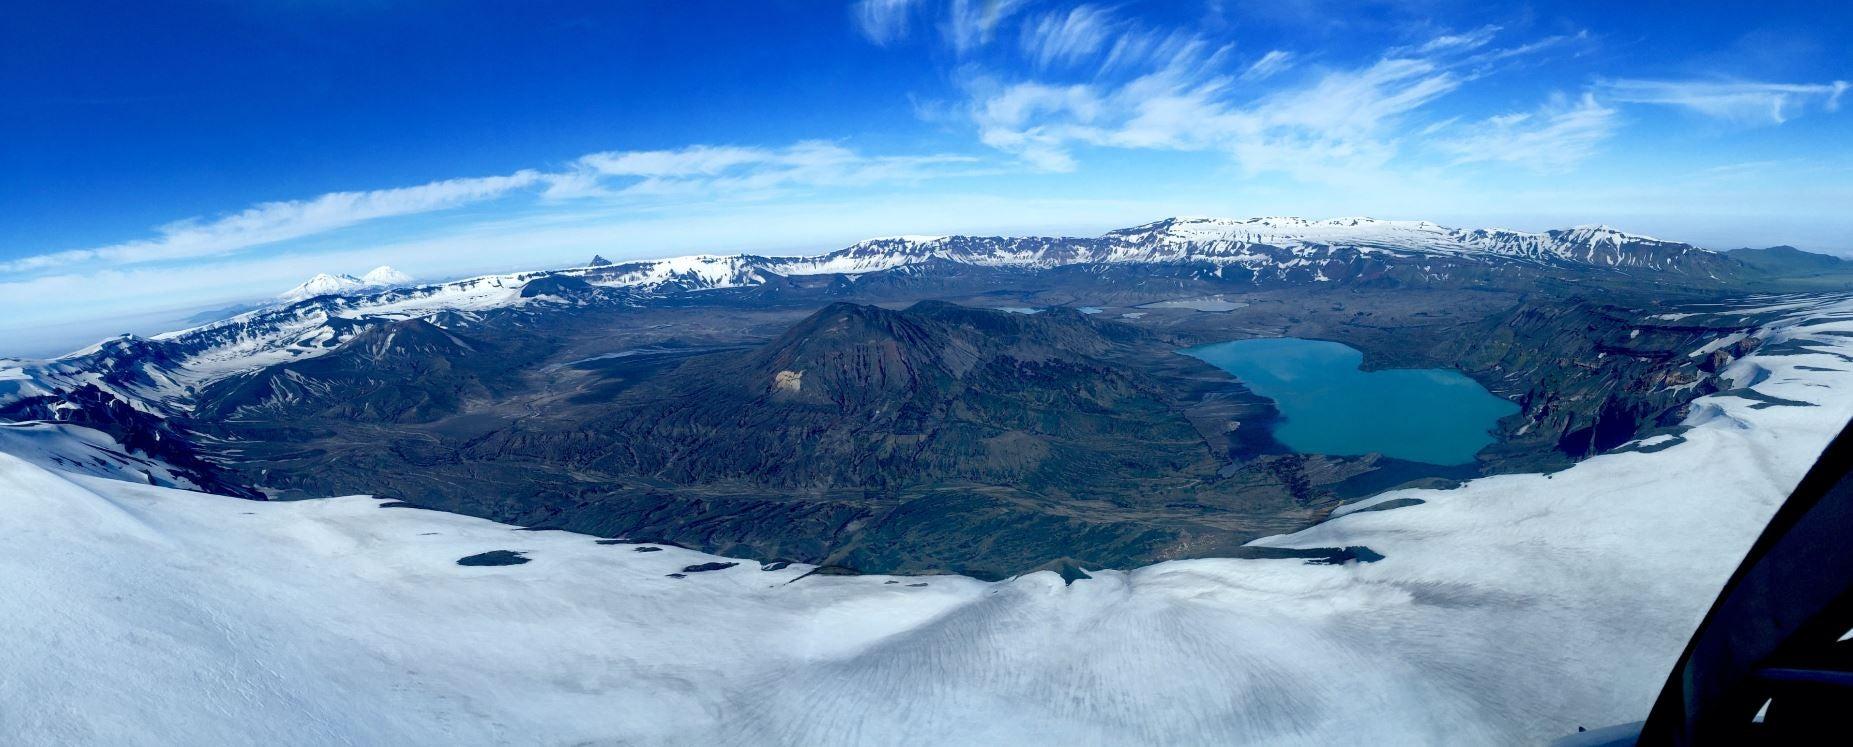 massive caldera